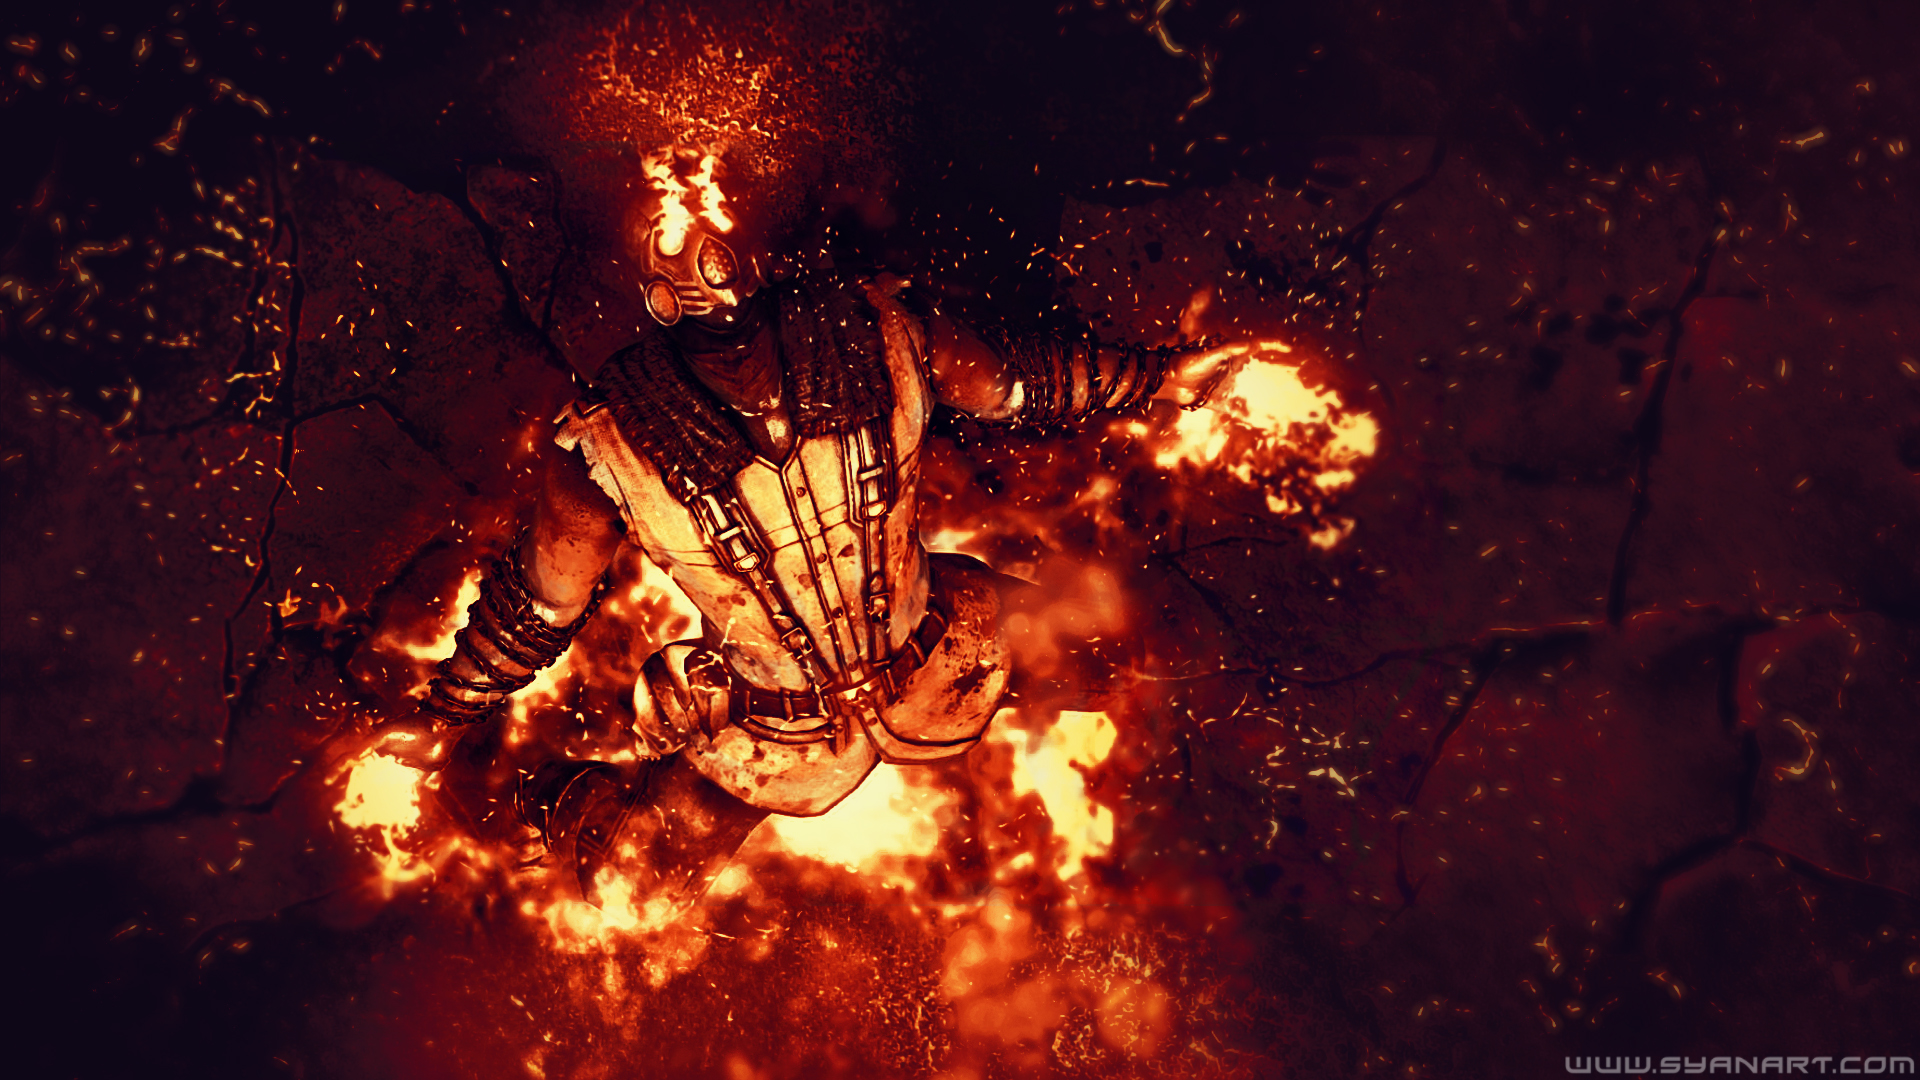 Mortal Kombat X Scorpion Wins Wallpaper Syanart Station